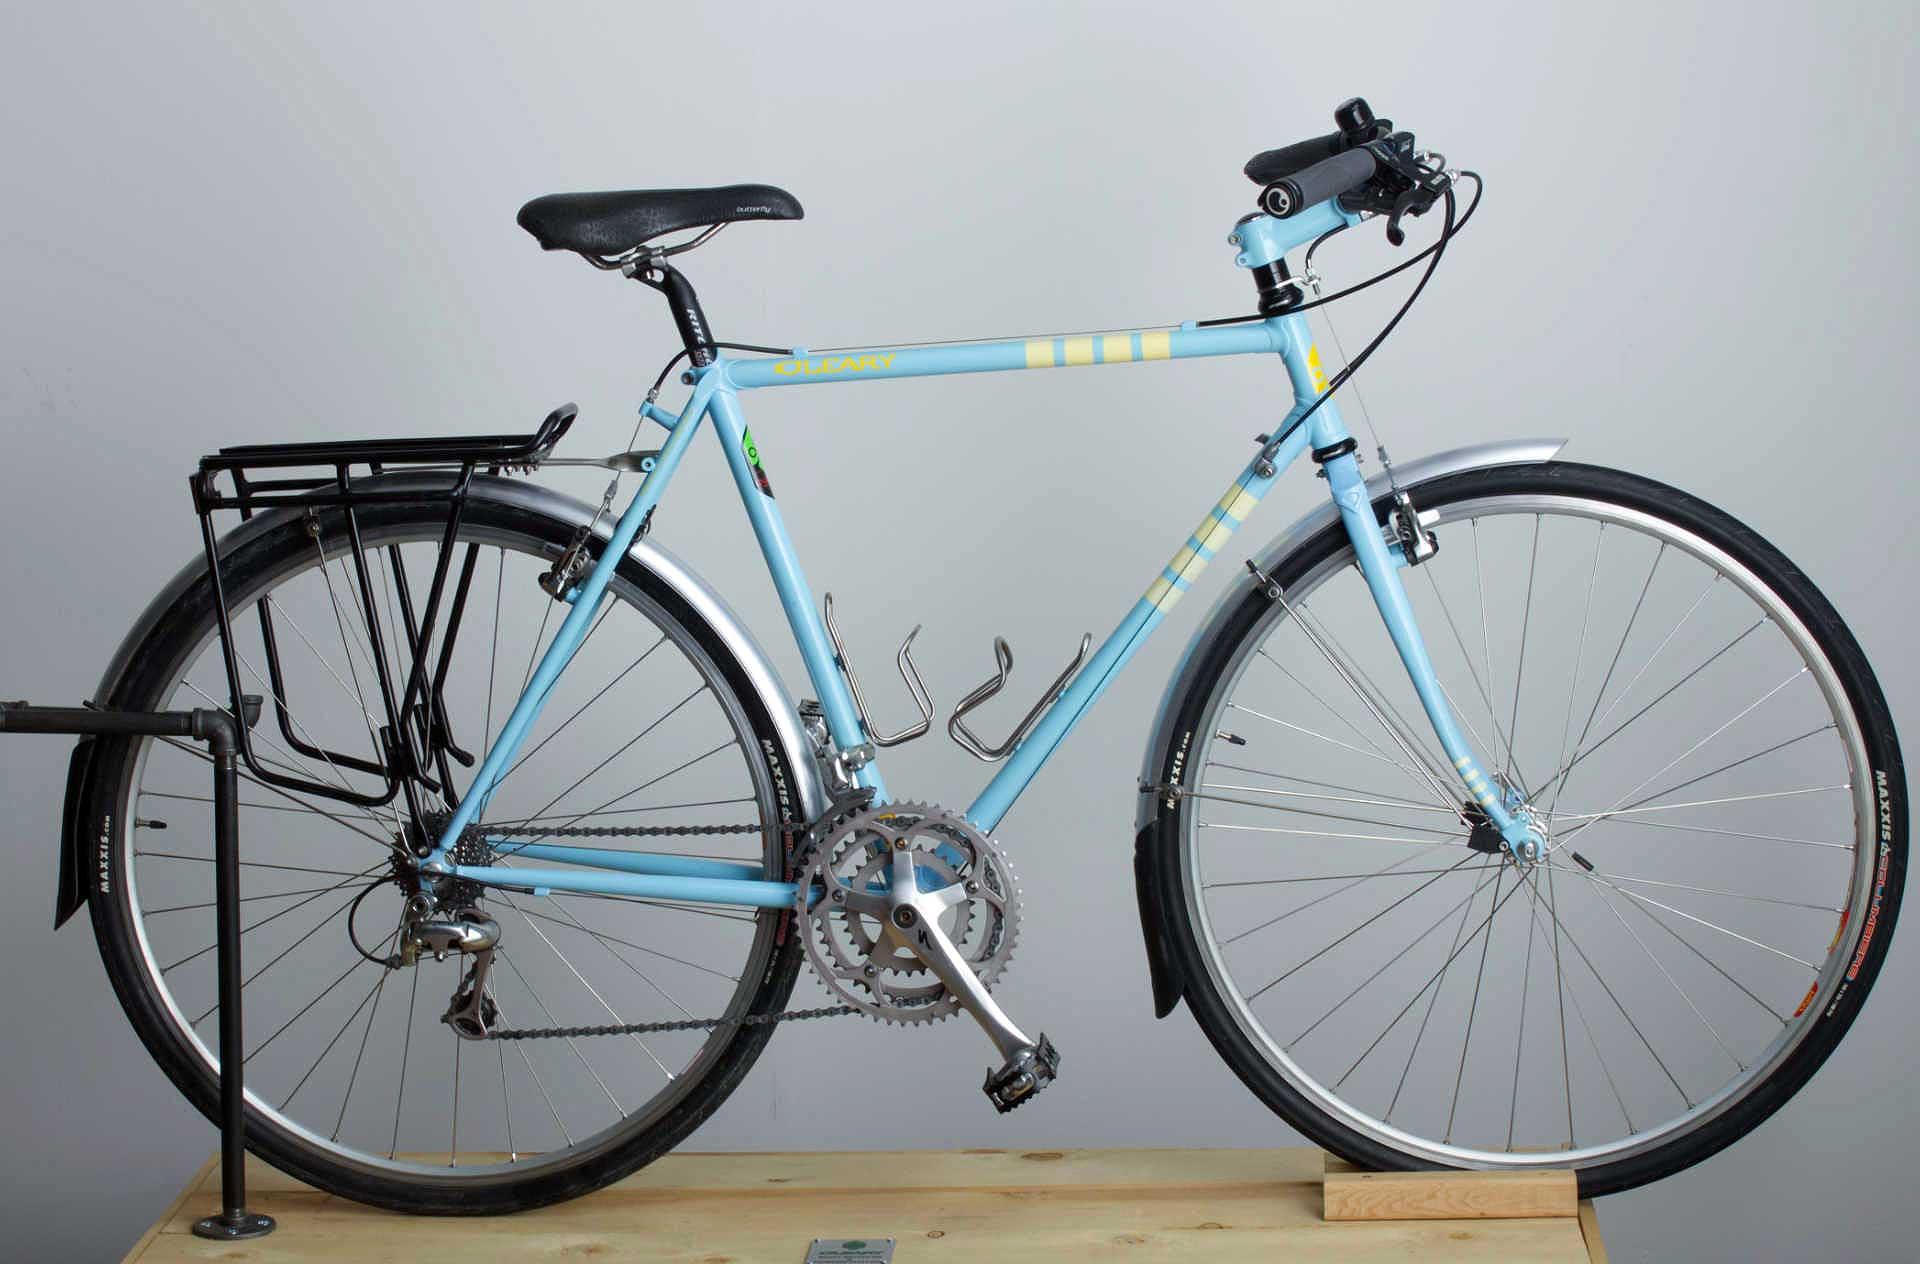 IMG_0025lilystouringbike-1920x1264